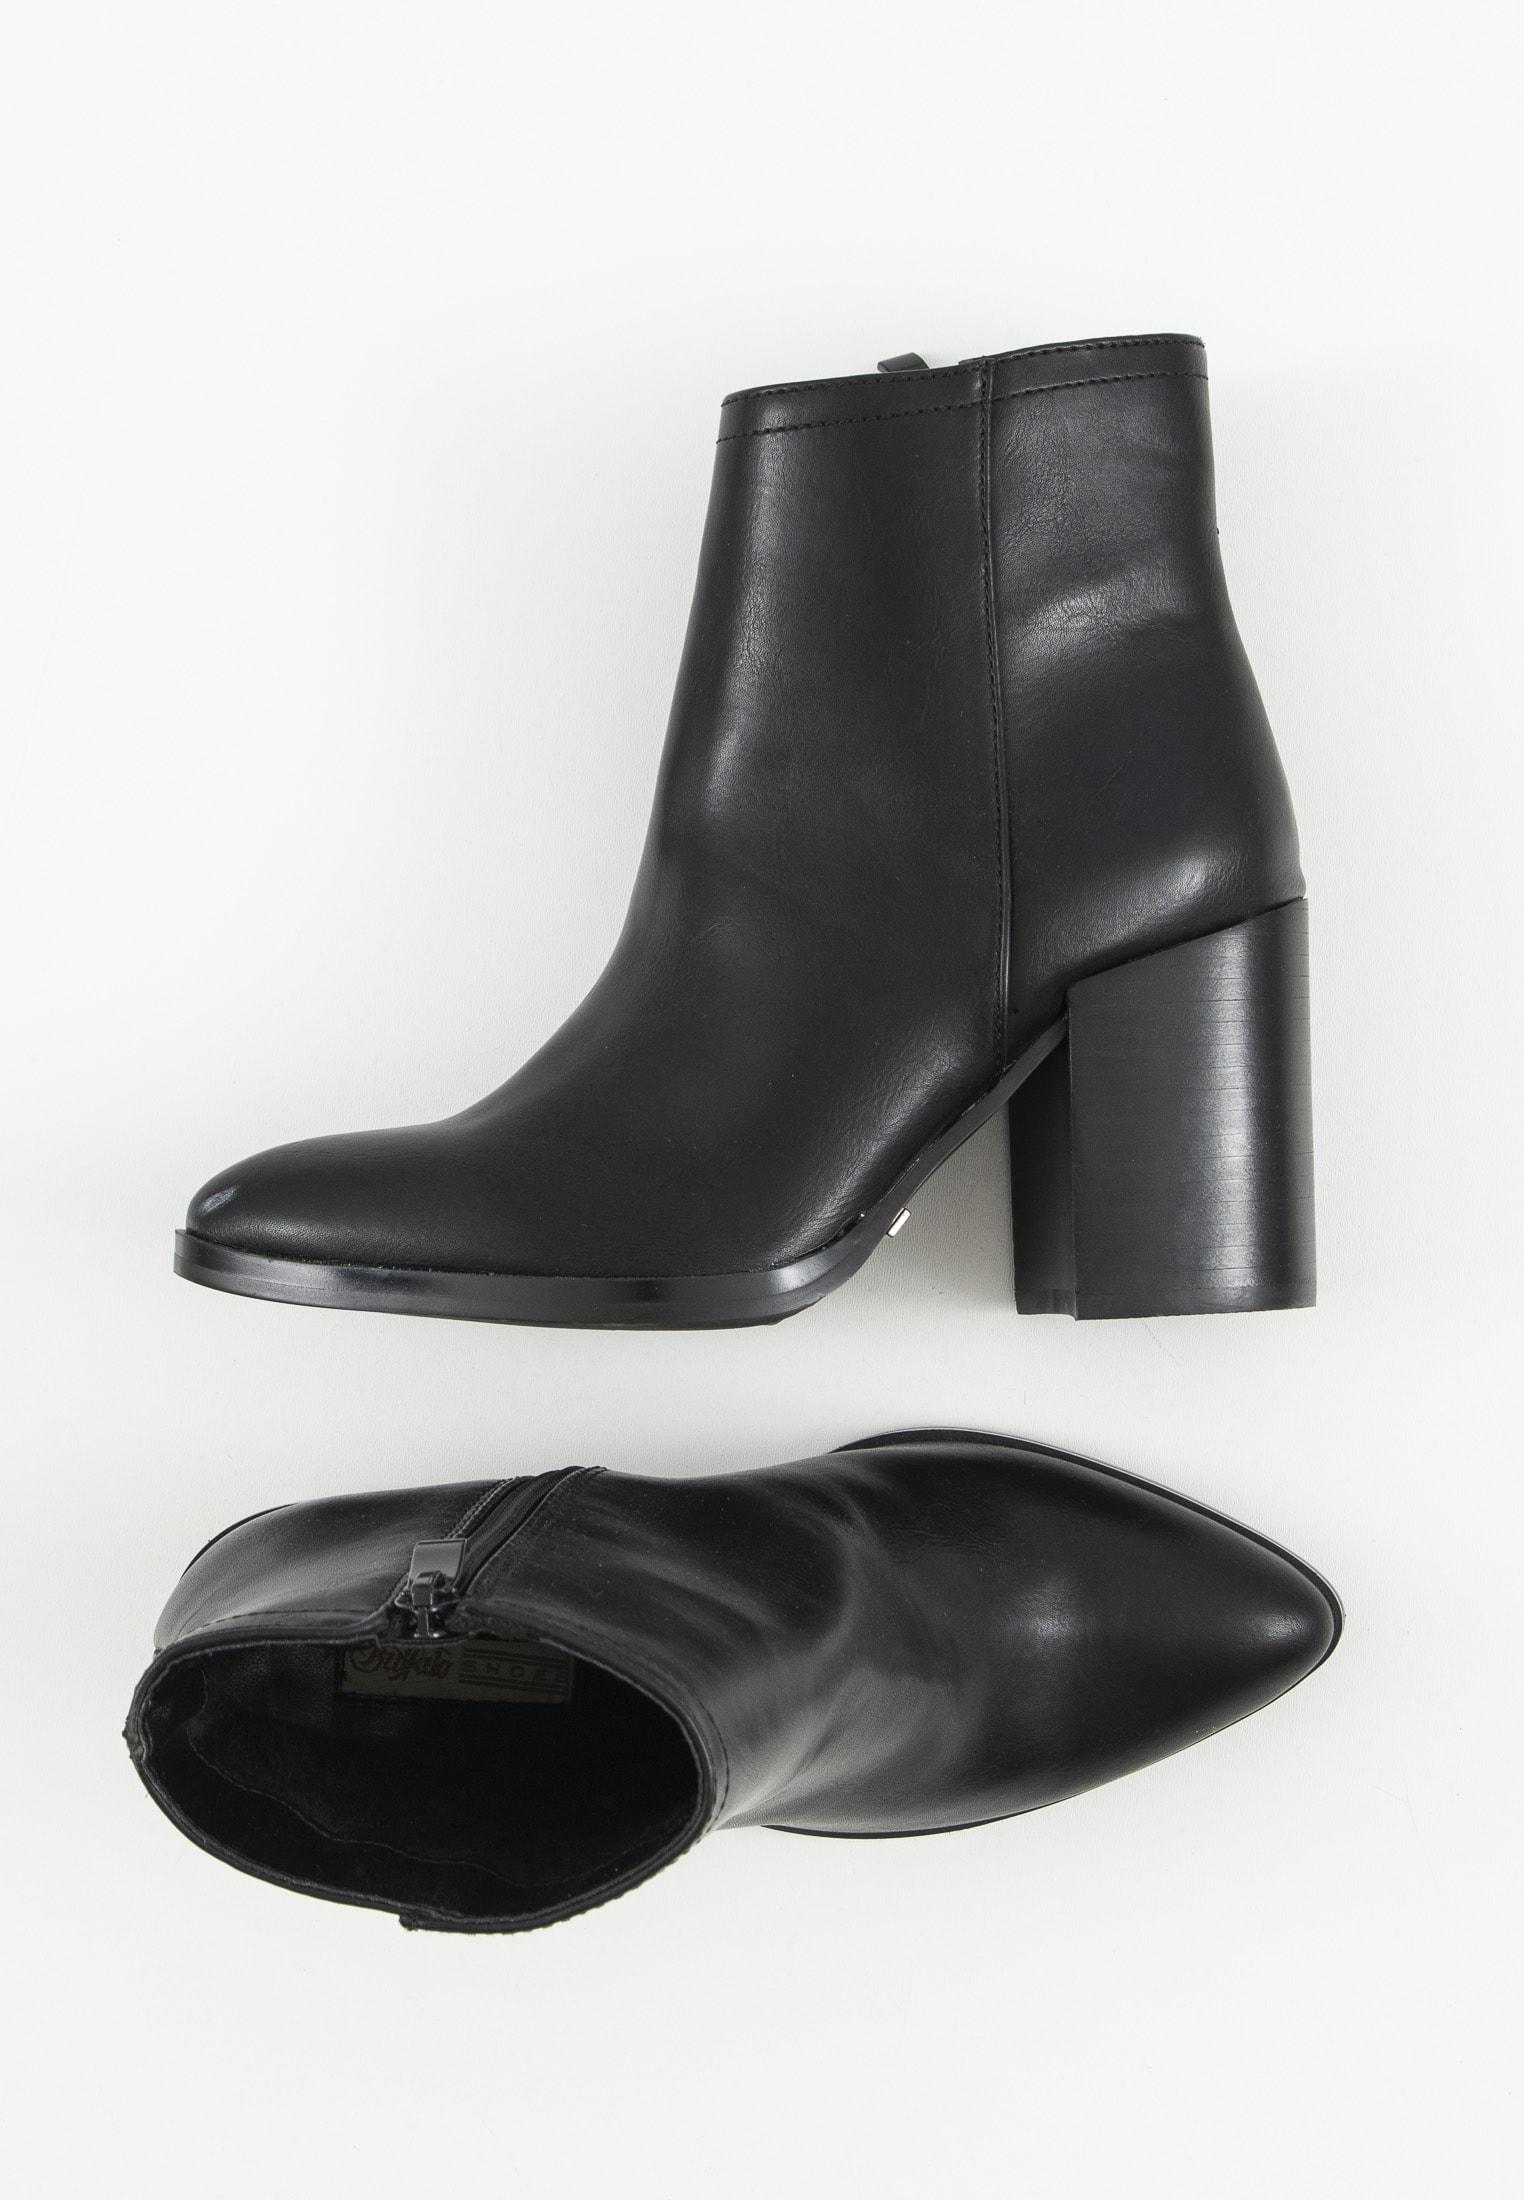 Buffalo Stiefel / Stiefelette / Boots Schwarz Gr.36